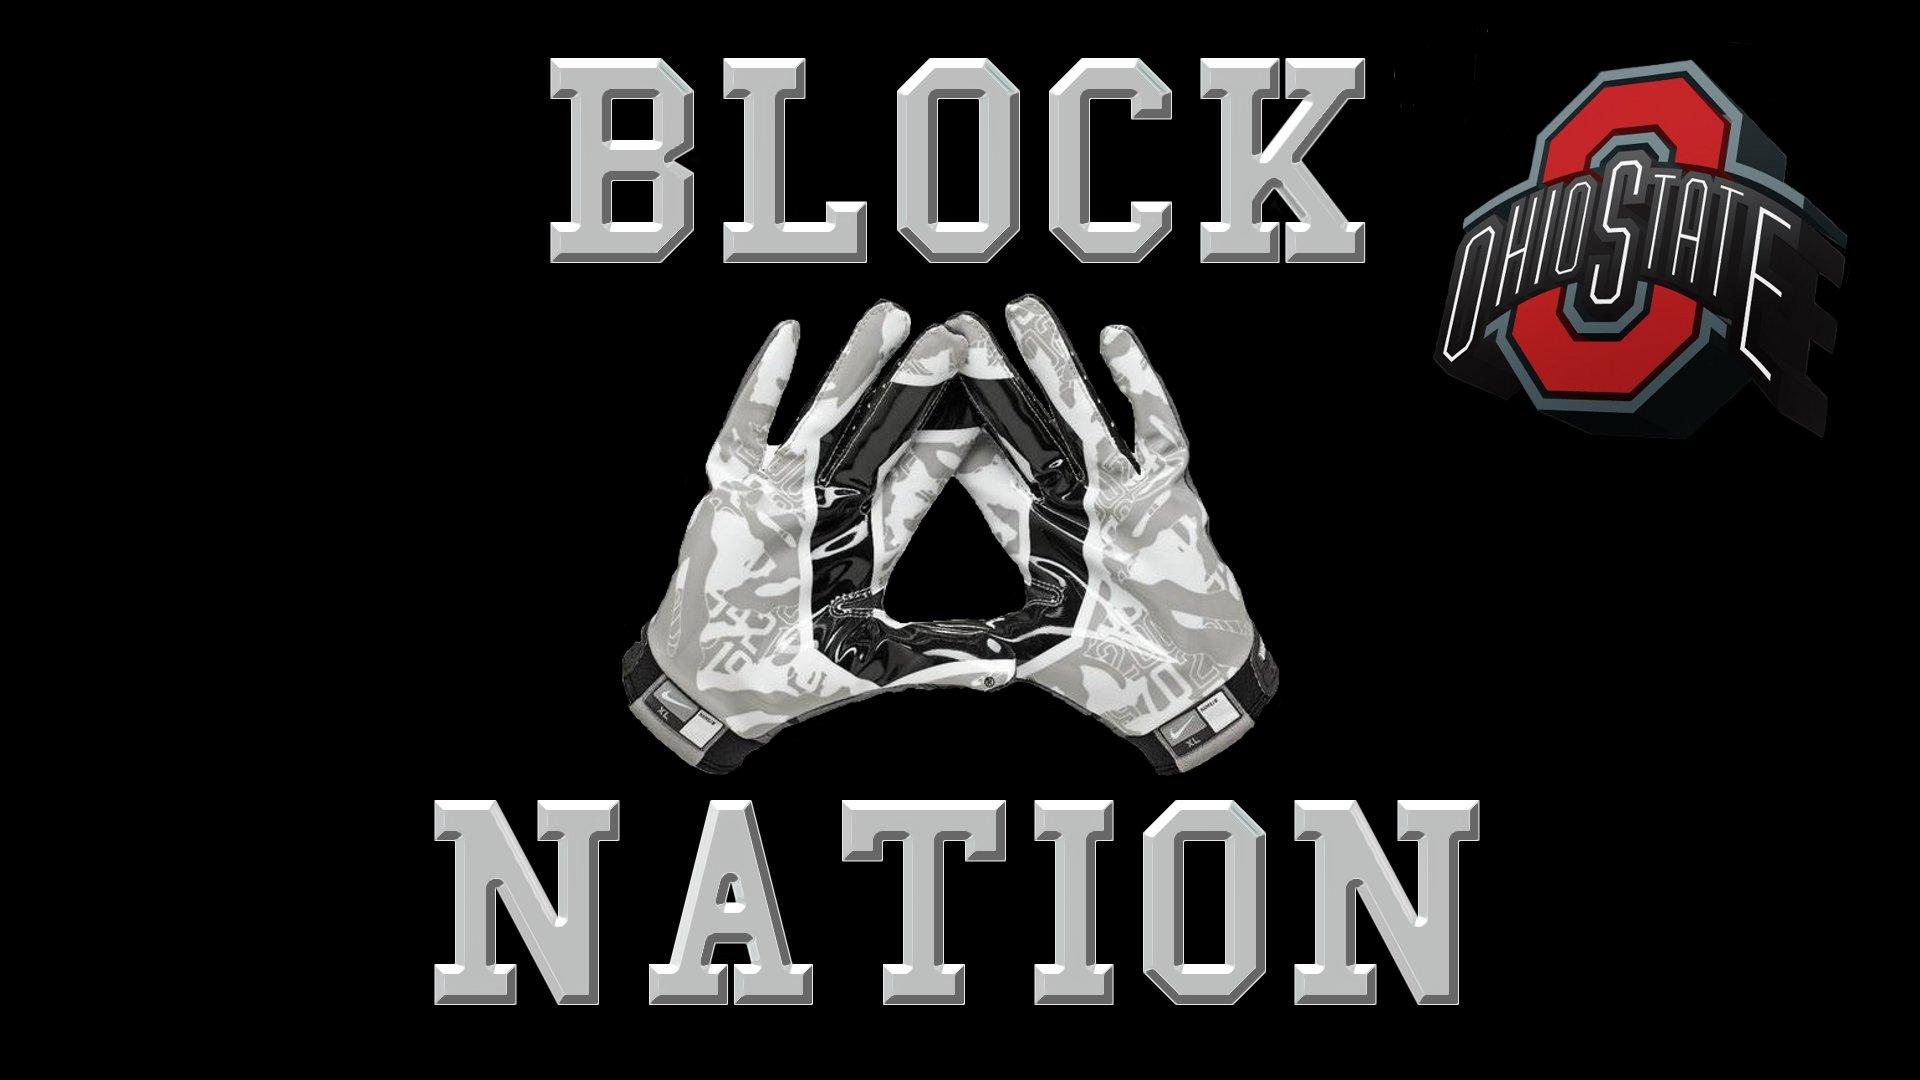 Ohio State Block O Nation   1920x1080   169 1920x1080